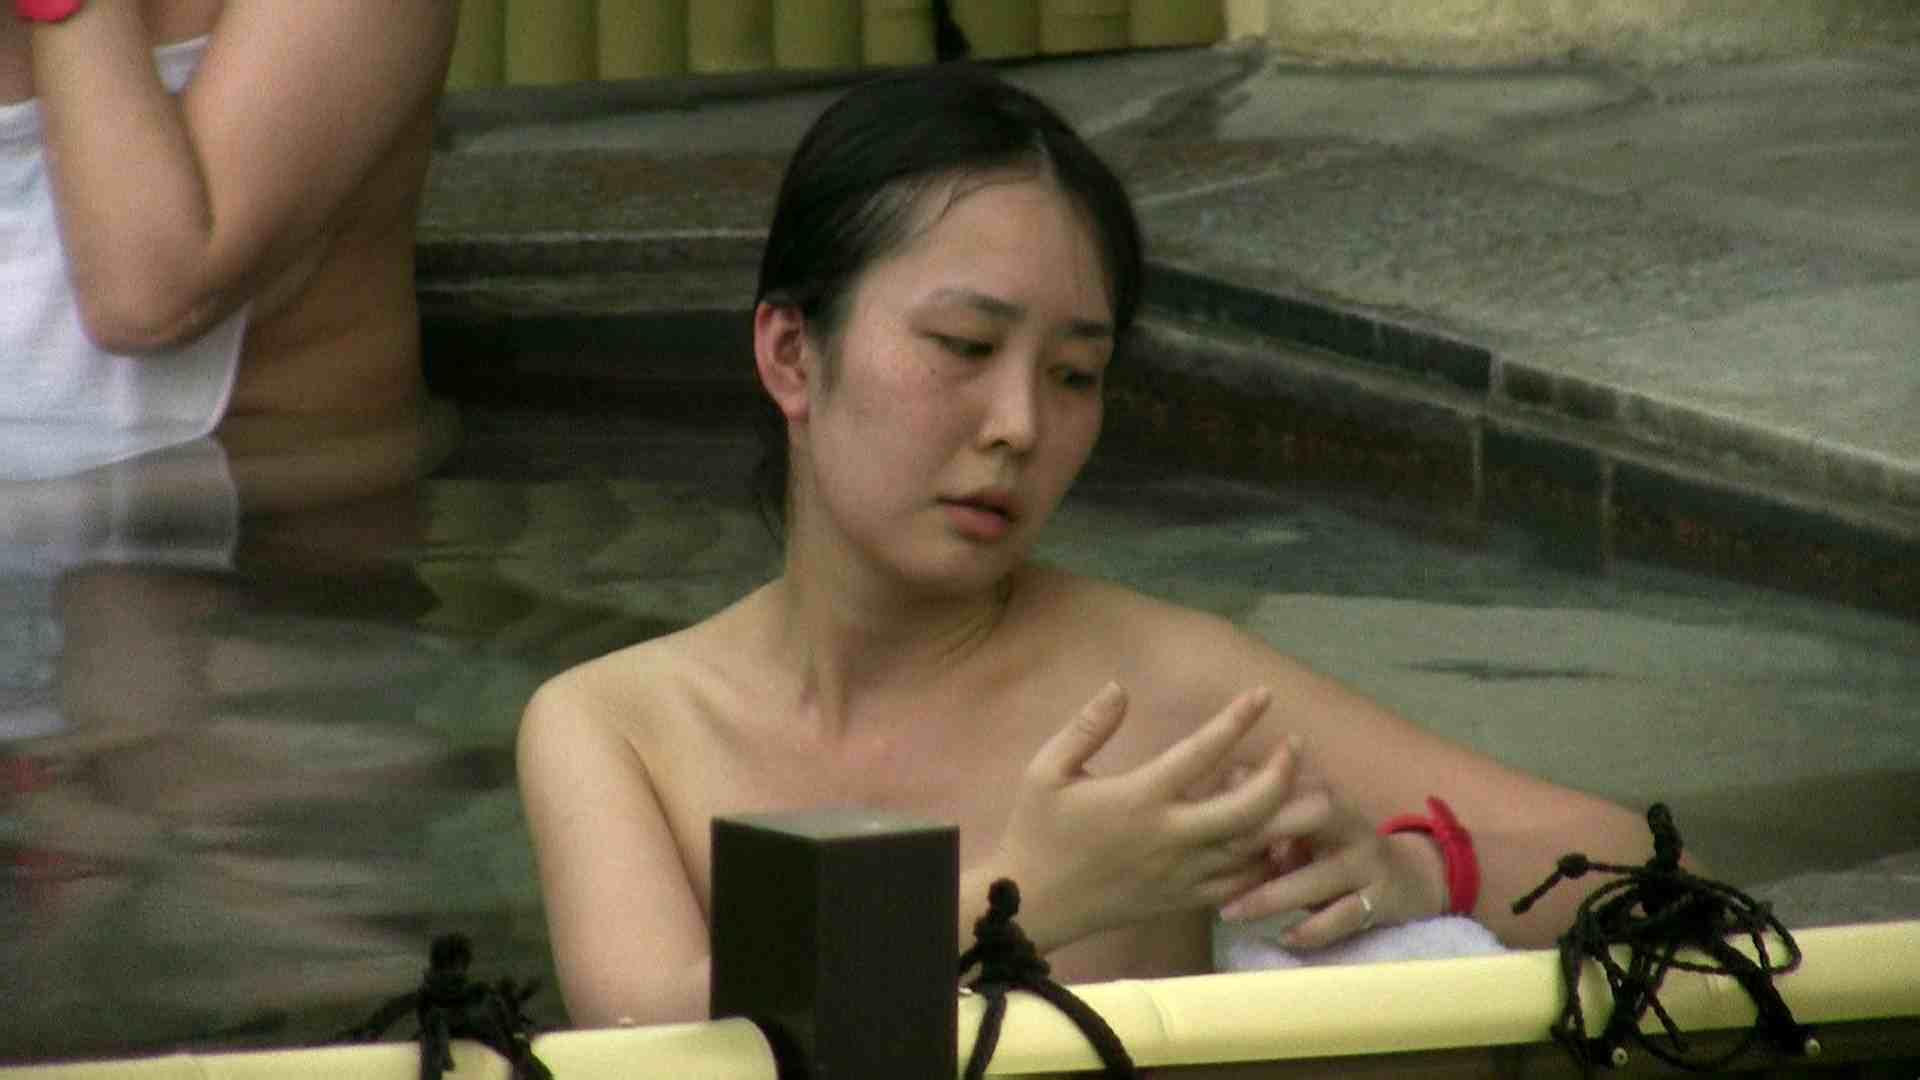 Aquaな露天風呂Vol.636 OL女体 | 露天  87連発 79